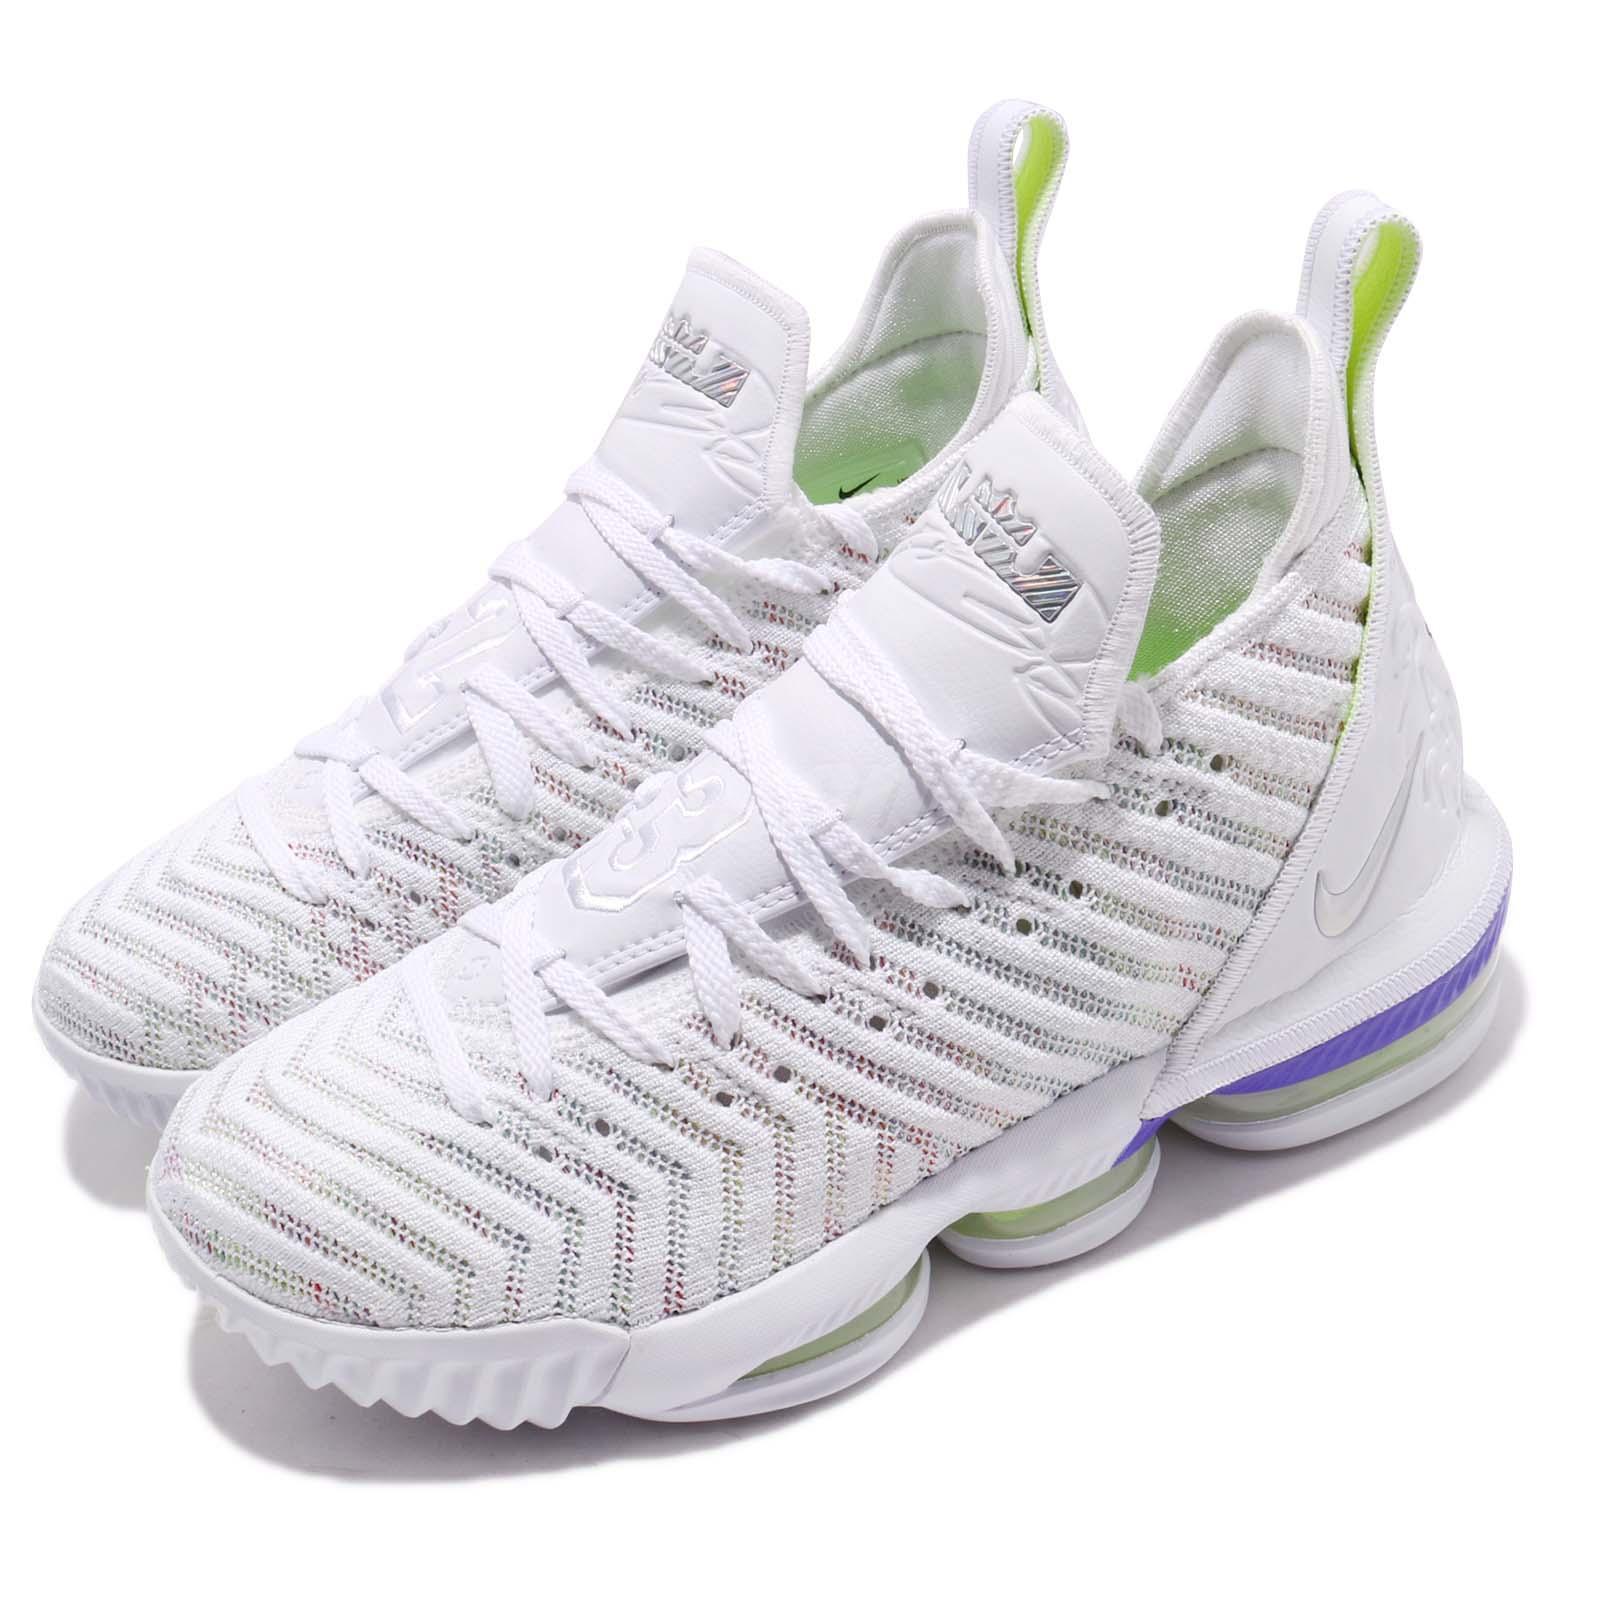 093b5bd41f37e Details about Nike Lebron XVI EP 16 Buzz Lightyear James White Men  Basketball Shoes AO2595-102